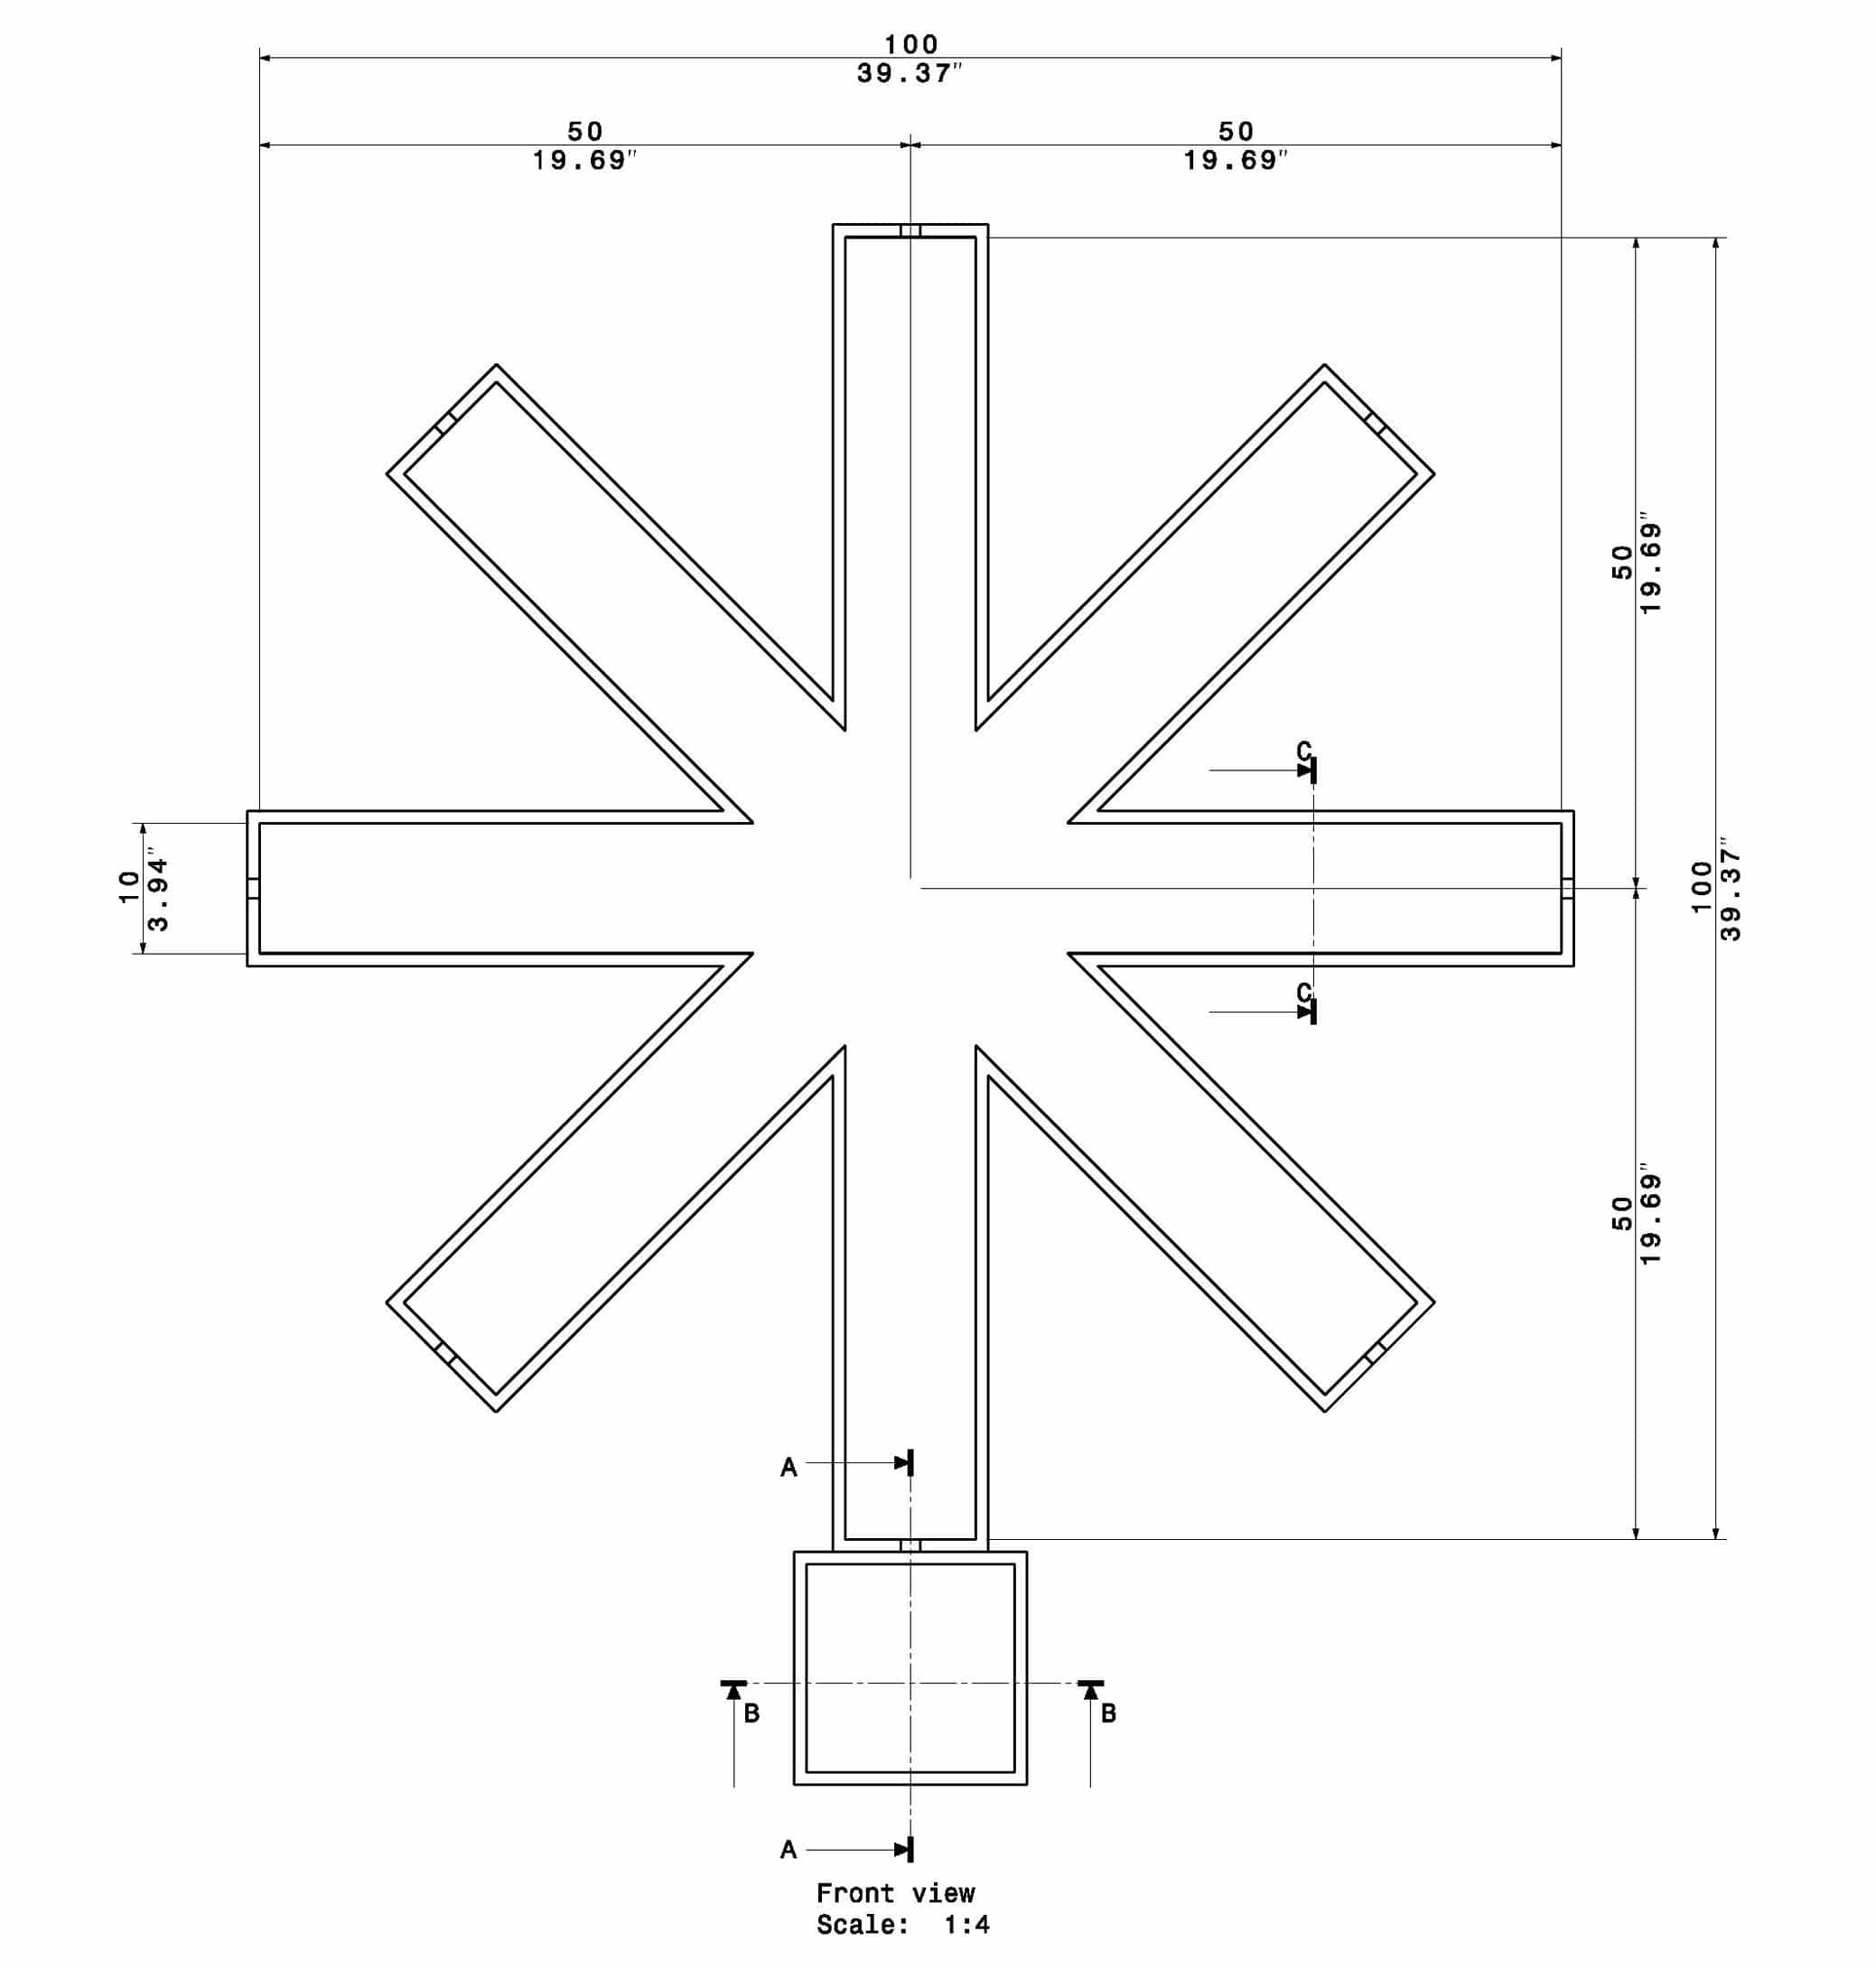 Radial Arm Maze - Rat Goal Box - Image 2